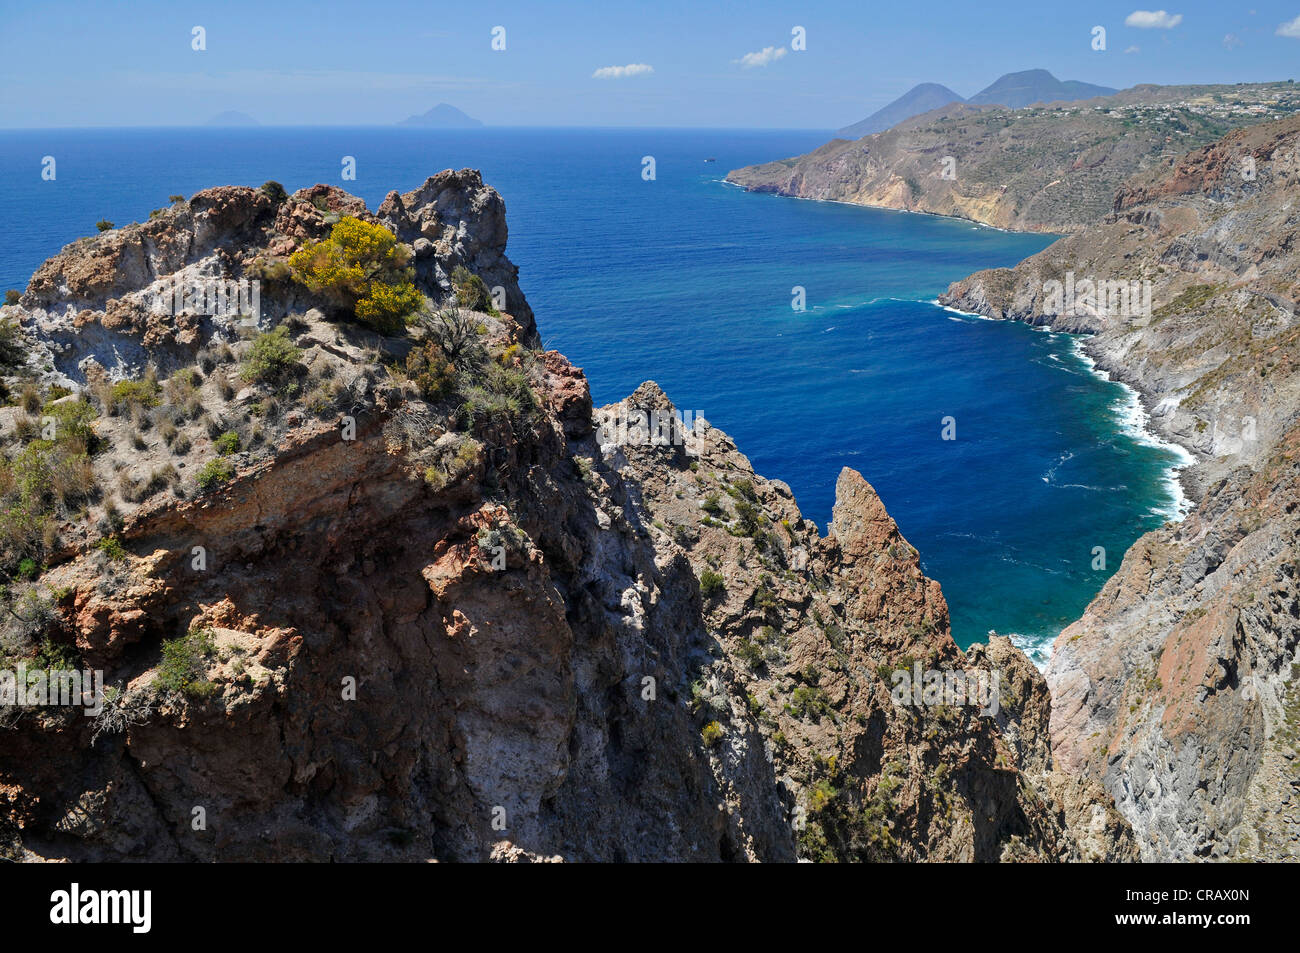 Cliffs of Lipari island, Aeolian Islands, Sicily, southern Italy, Italy, Europe - Stock Image